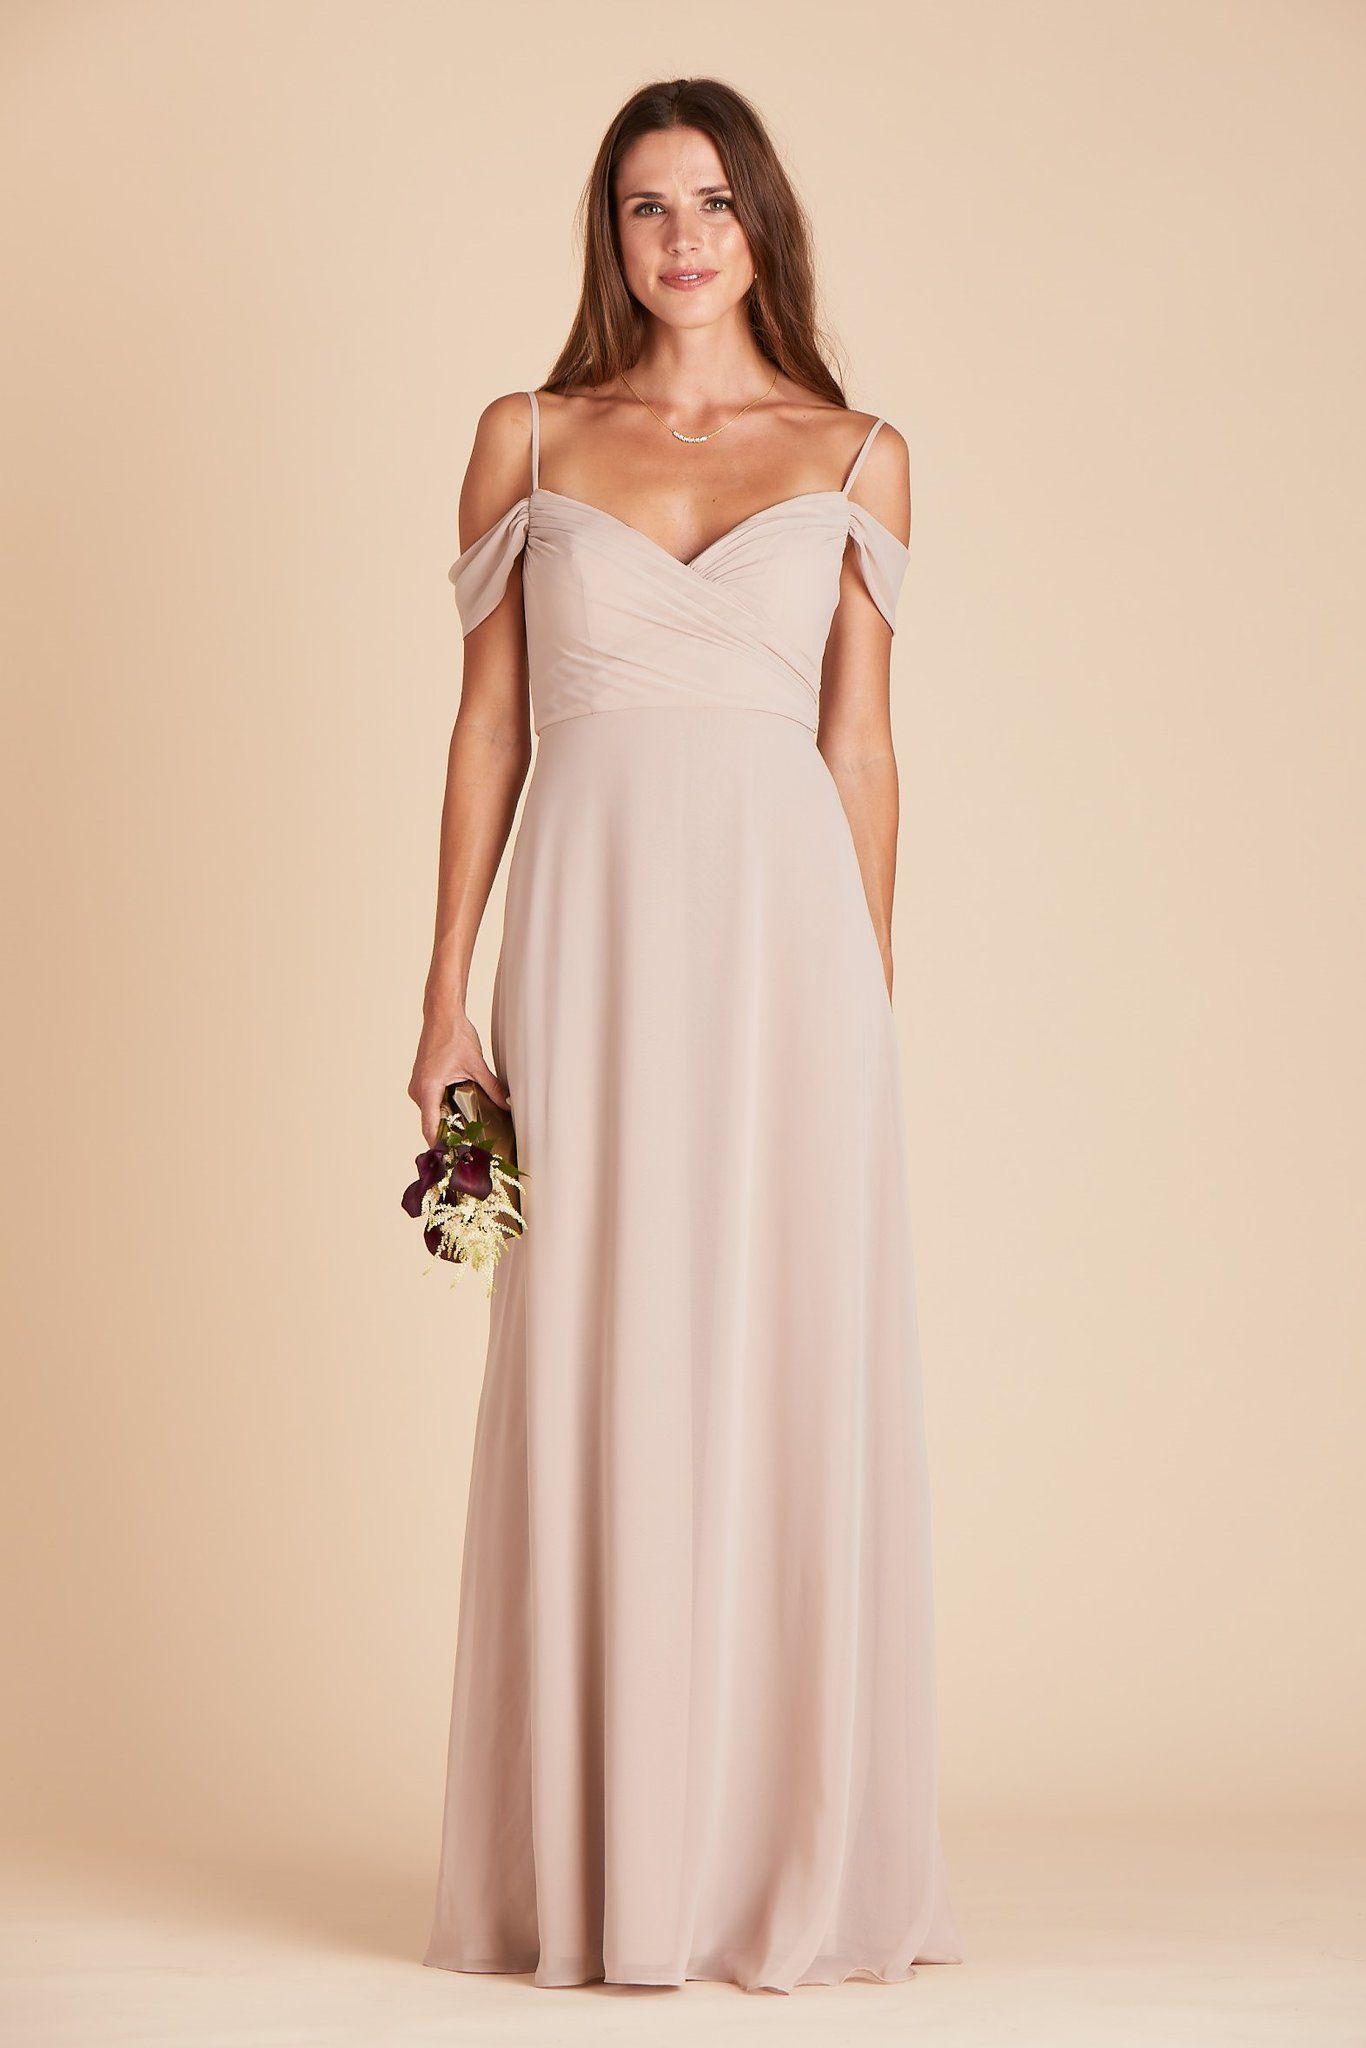 43+ Taupe wedding dress sleeve info